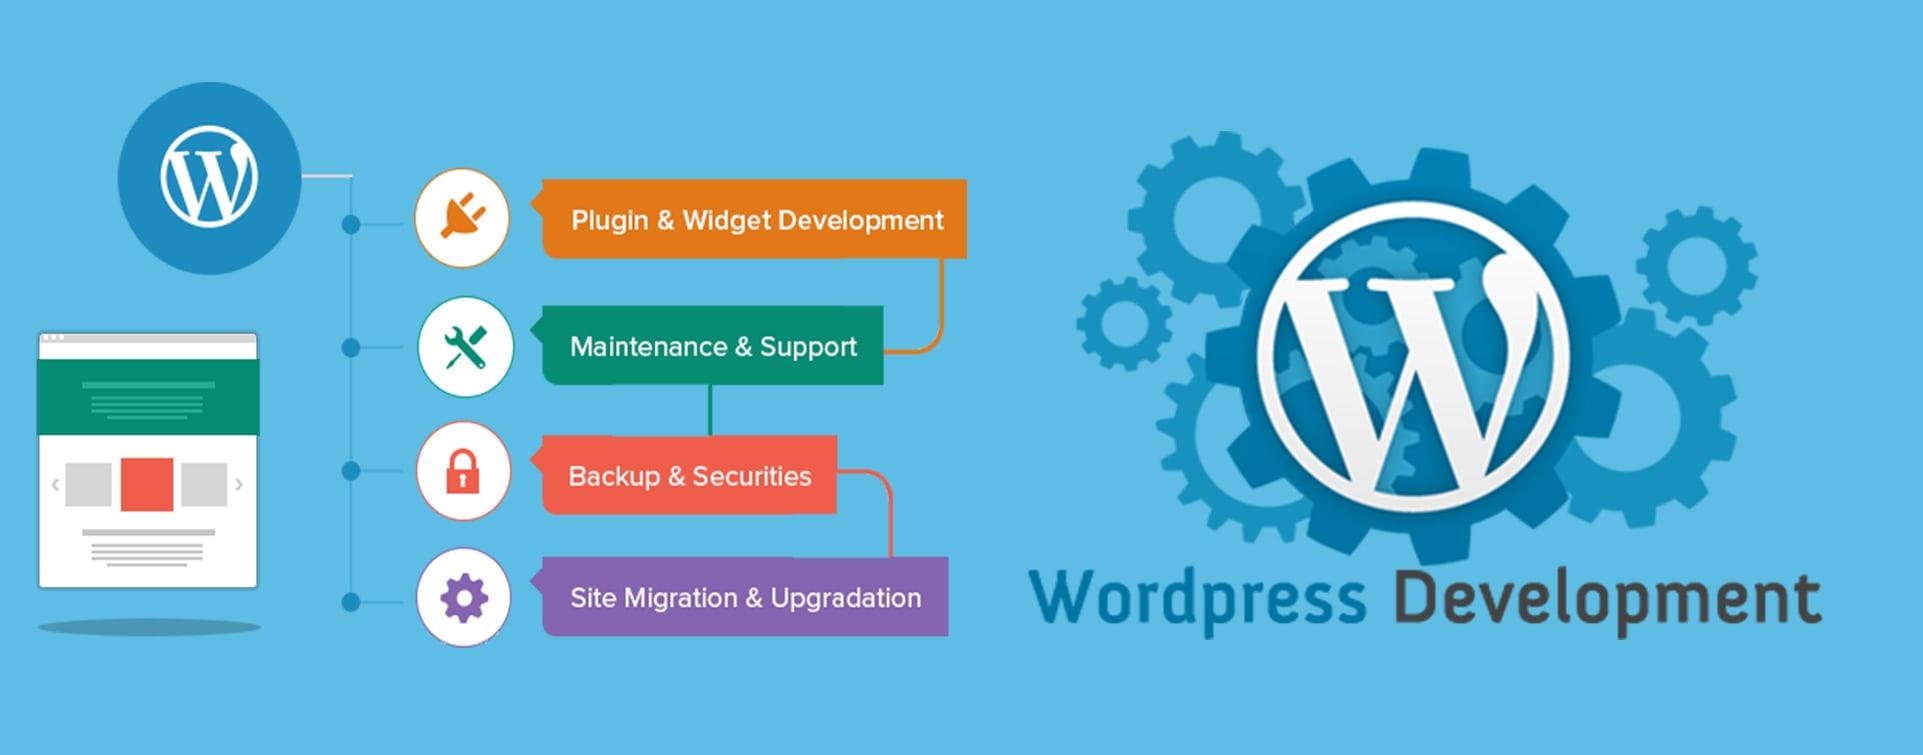 WordPress Development Lion Vision Technology